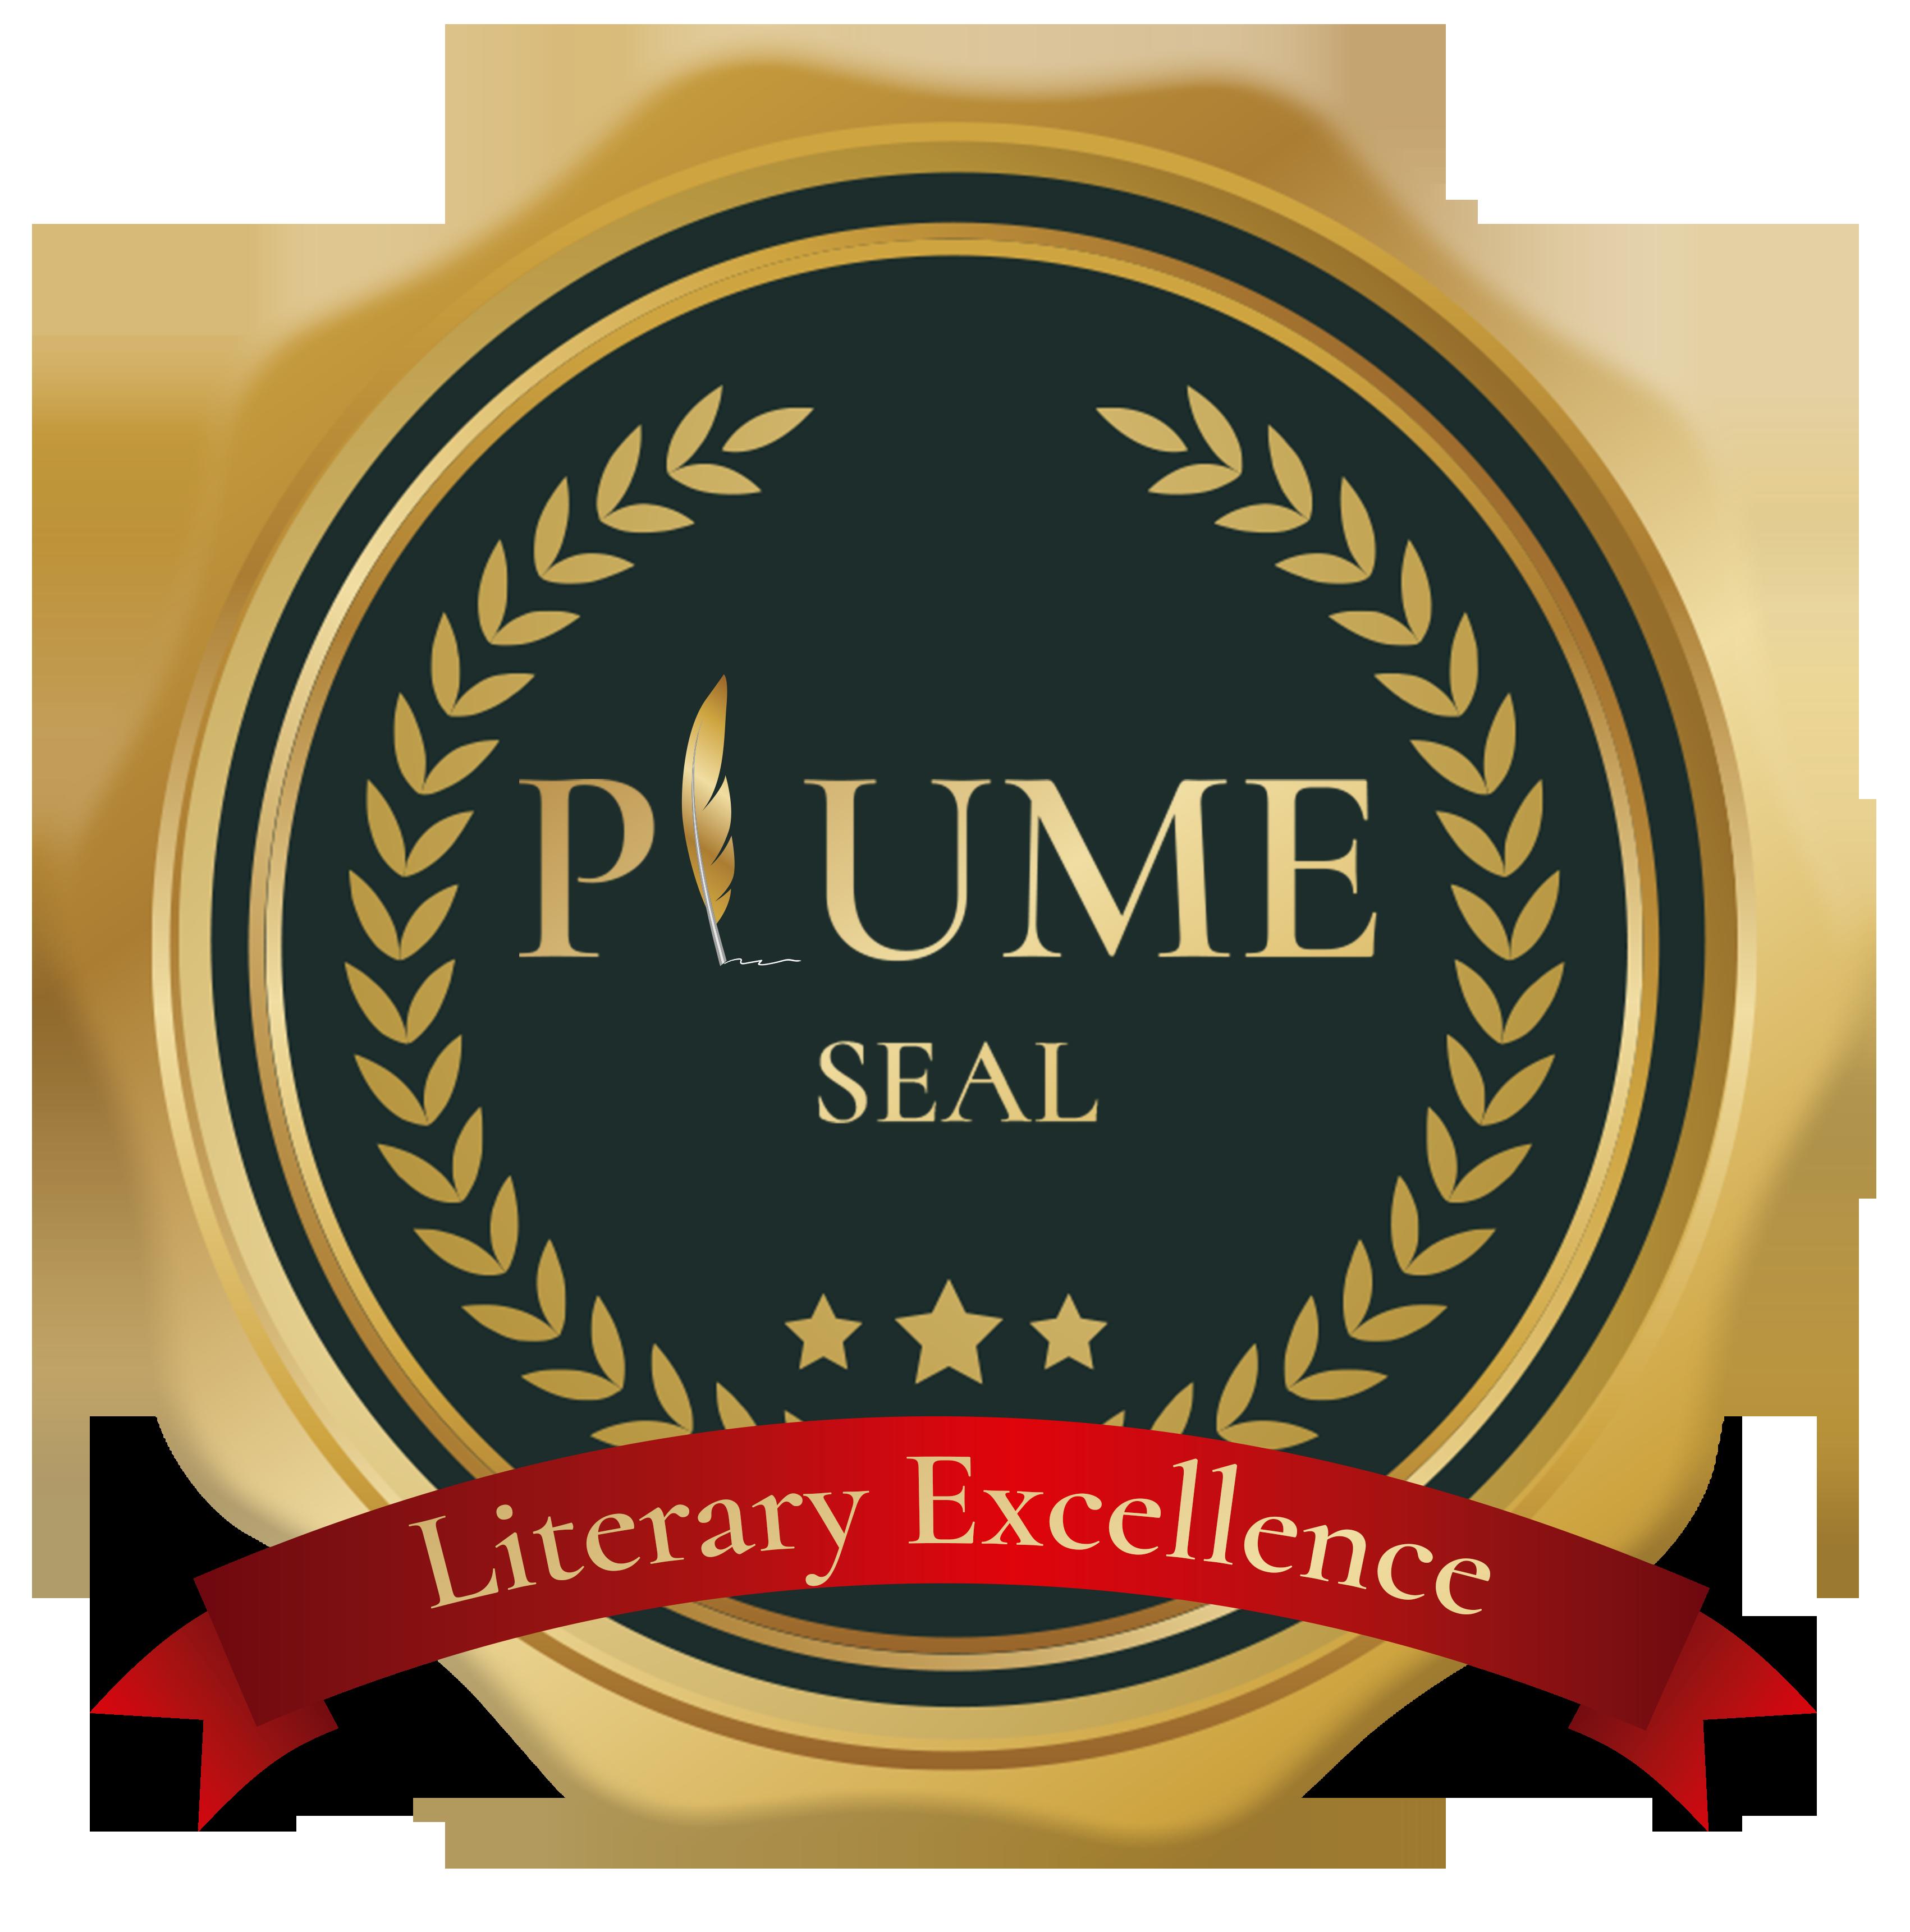 Plume Award